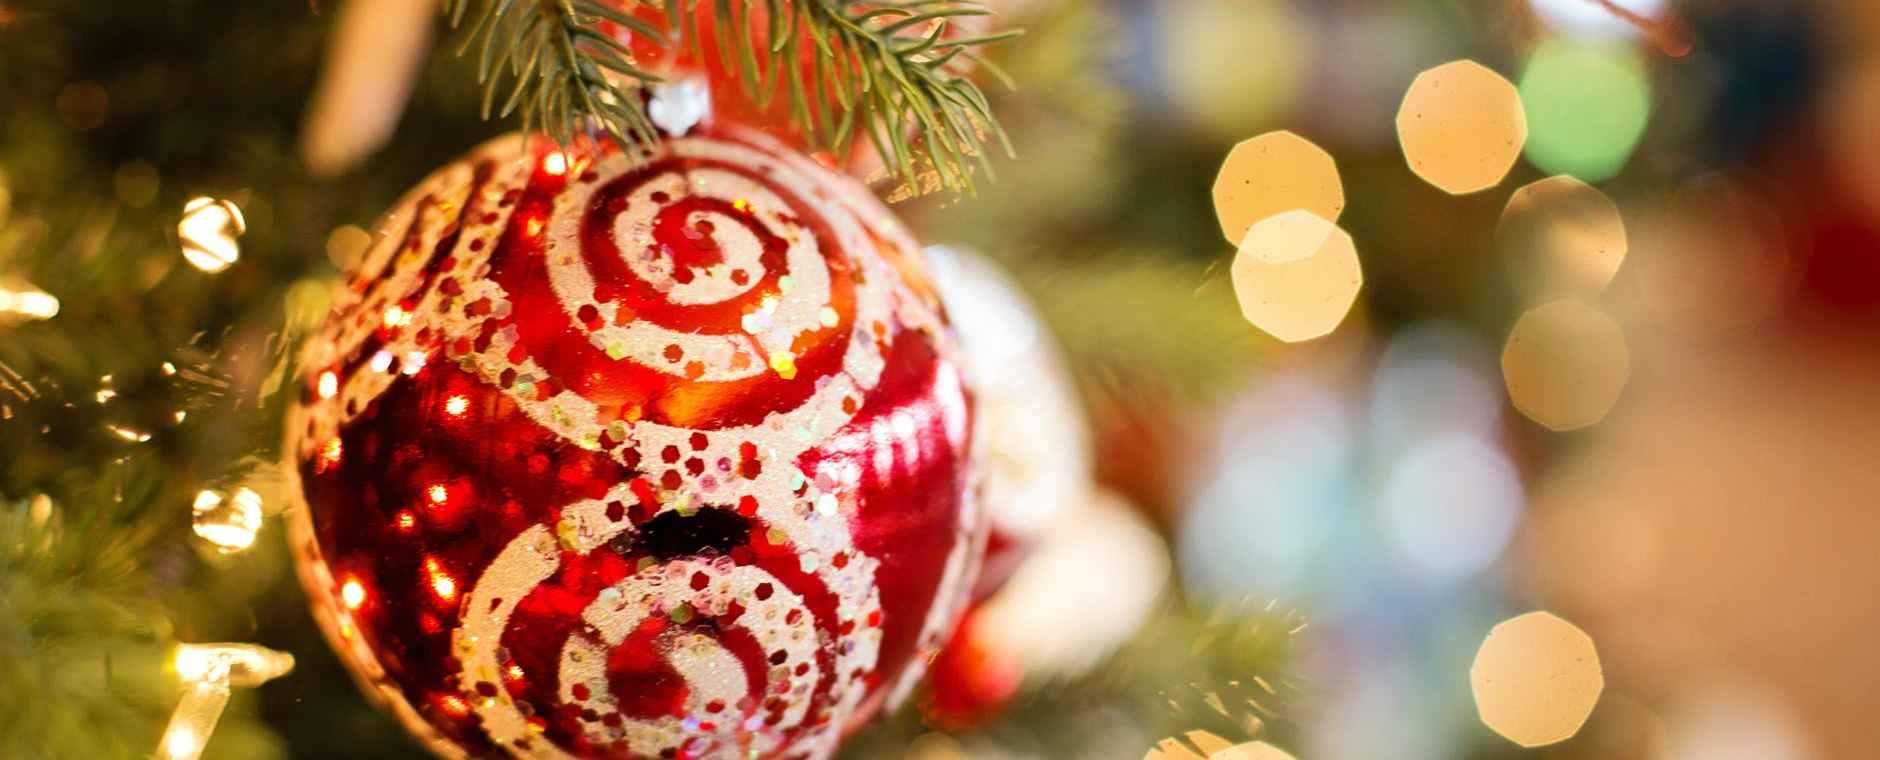 chirstmas tree, ornament